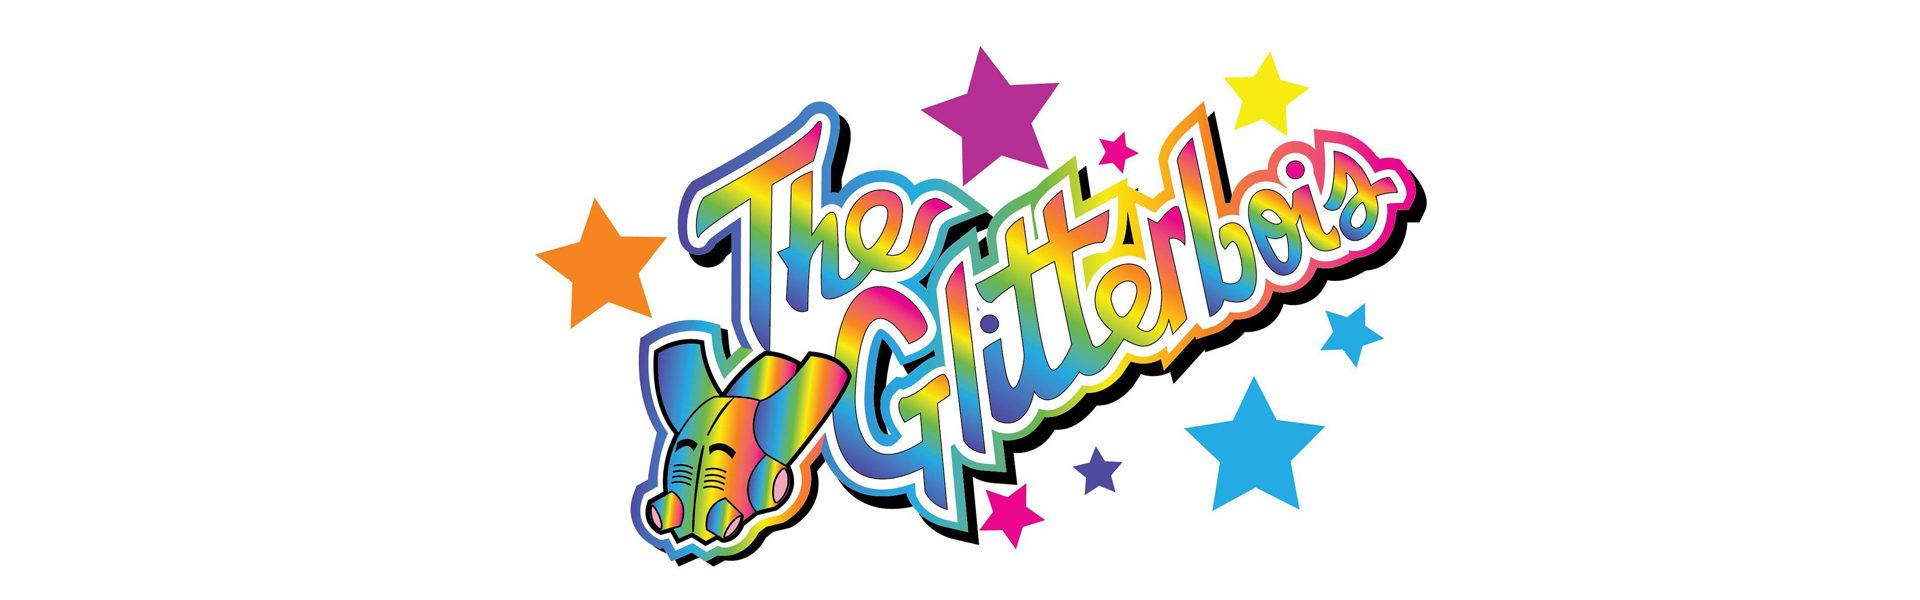 OMG it's the Glitterbois!